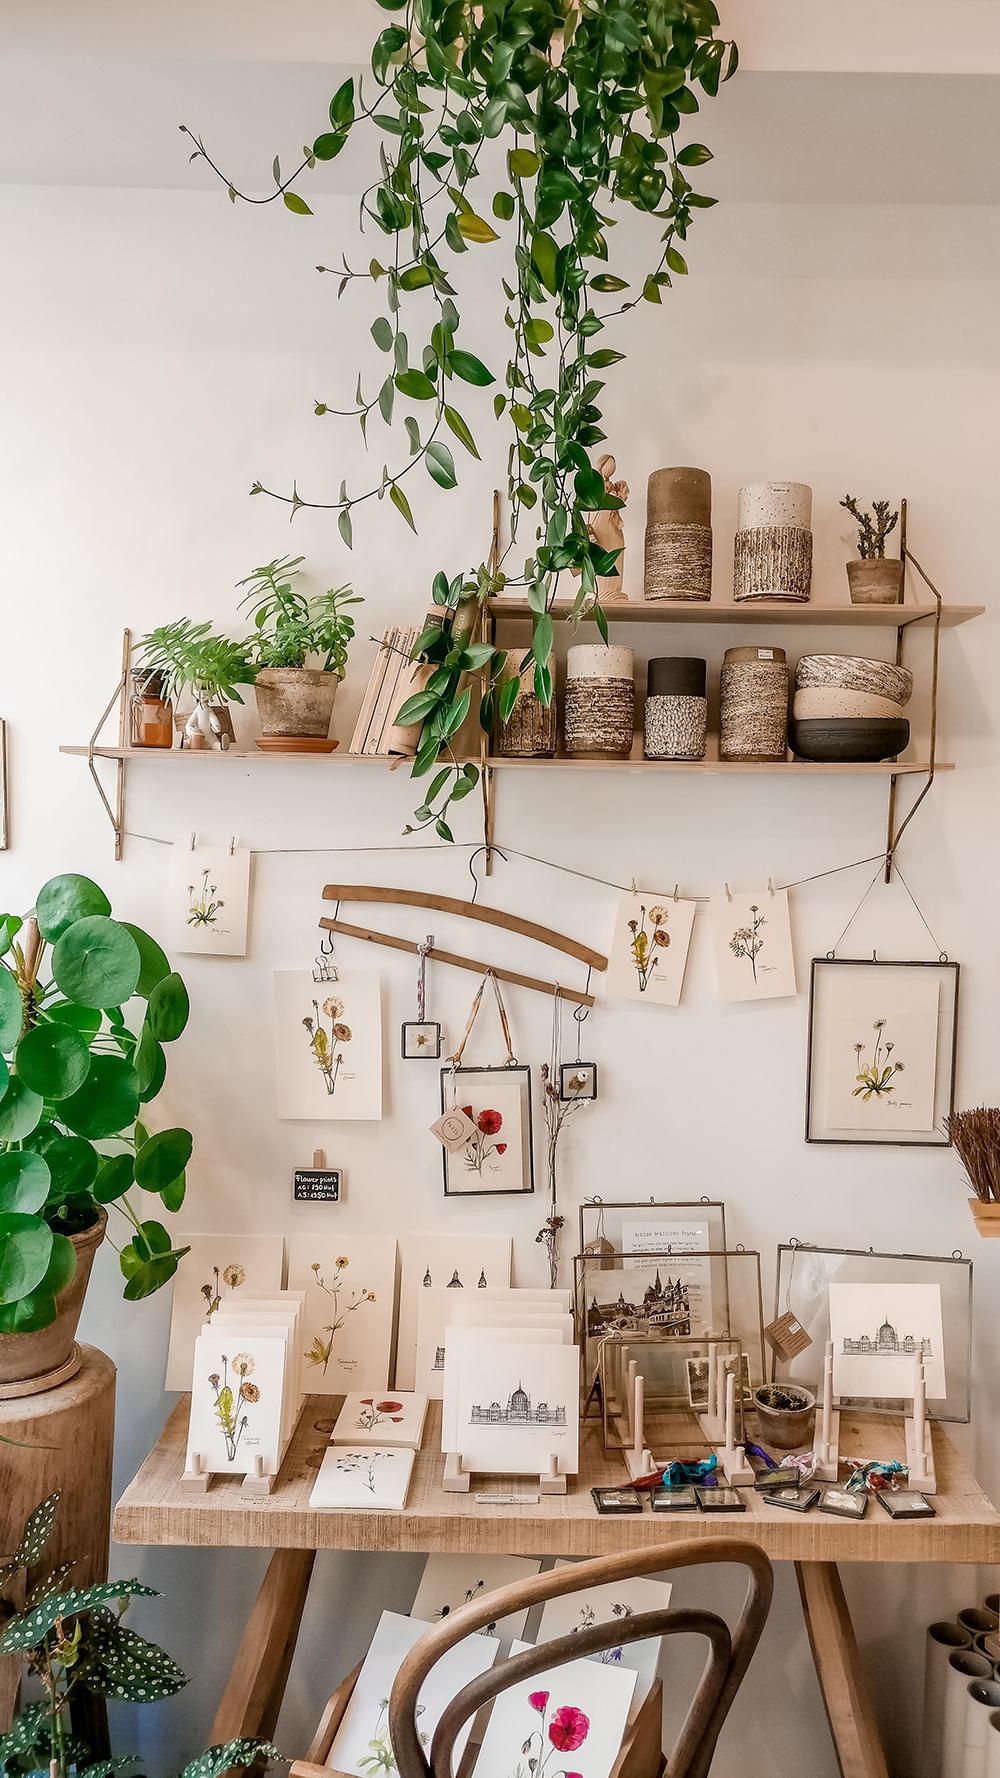 PaUZa - Budapest design shop guide to best Hungarian souvenirs | Aliz's Wonderland